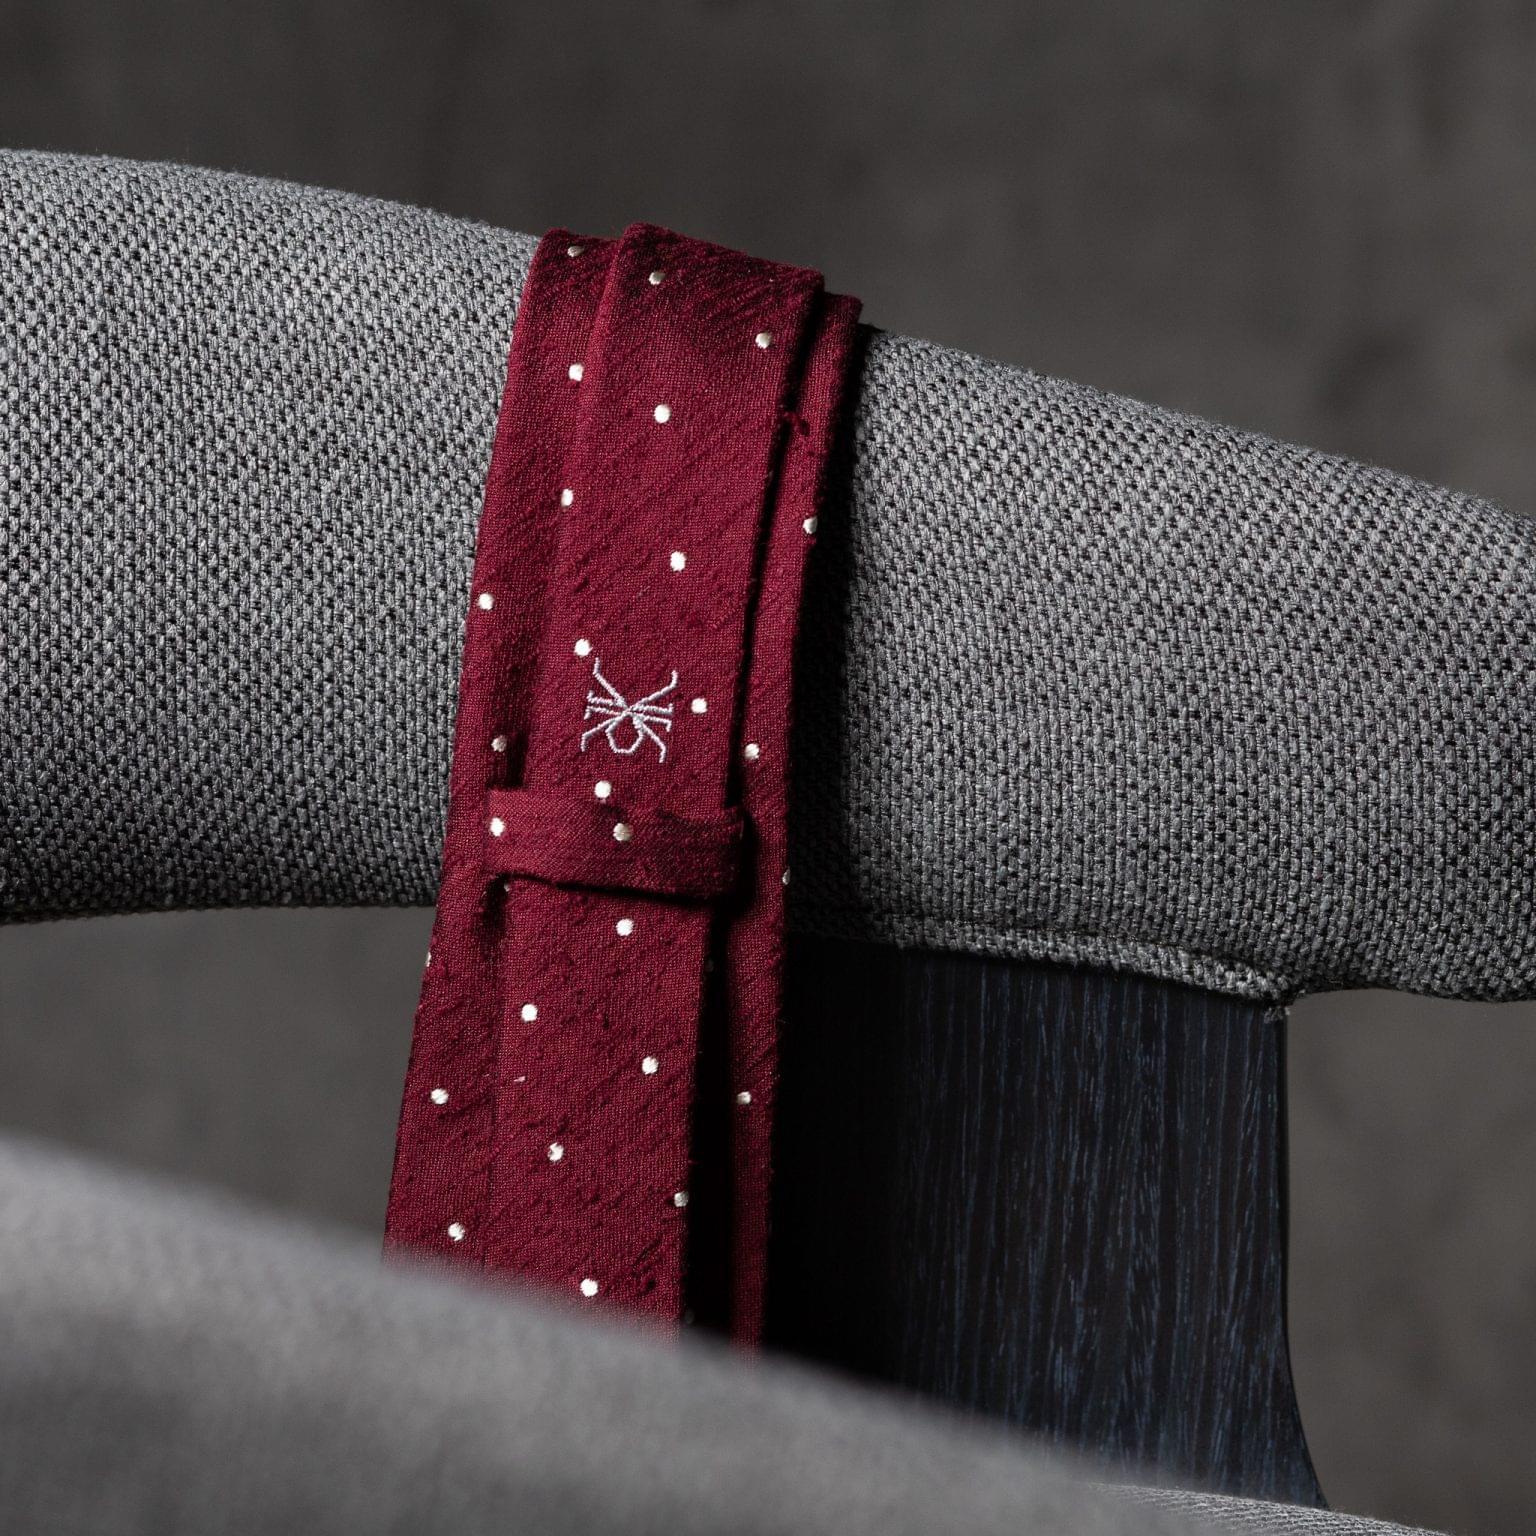 SHANTUNG-0528-Tie-Initials-Corbata-Iniciales-The-Seelk-4